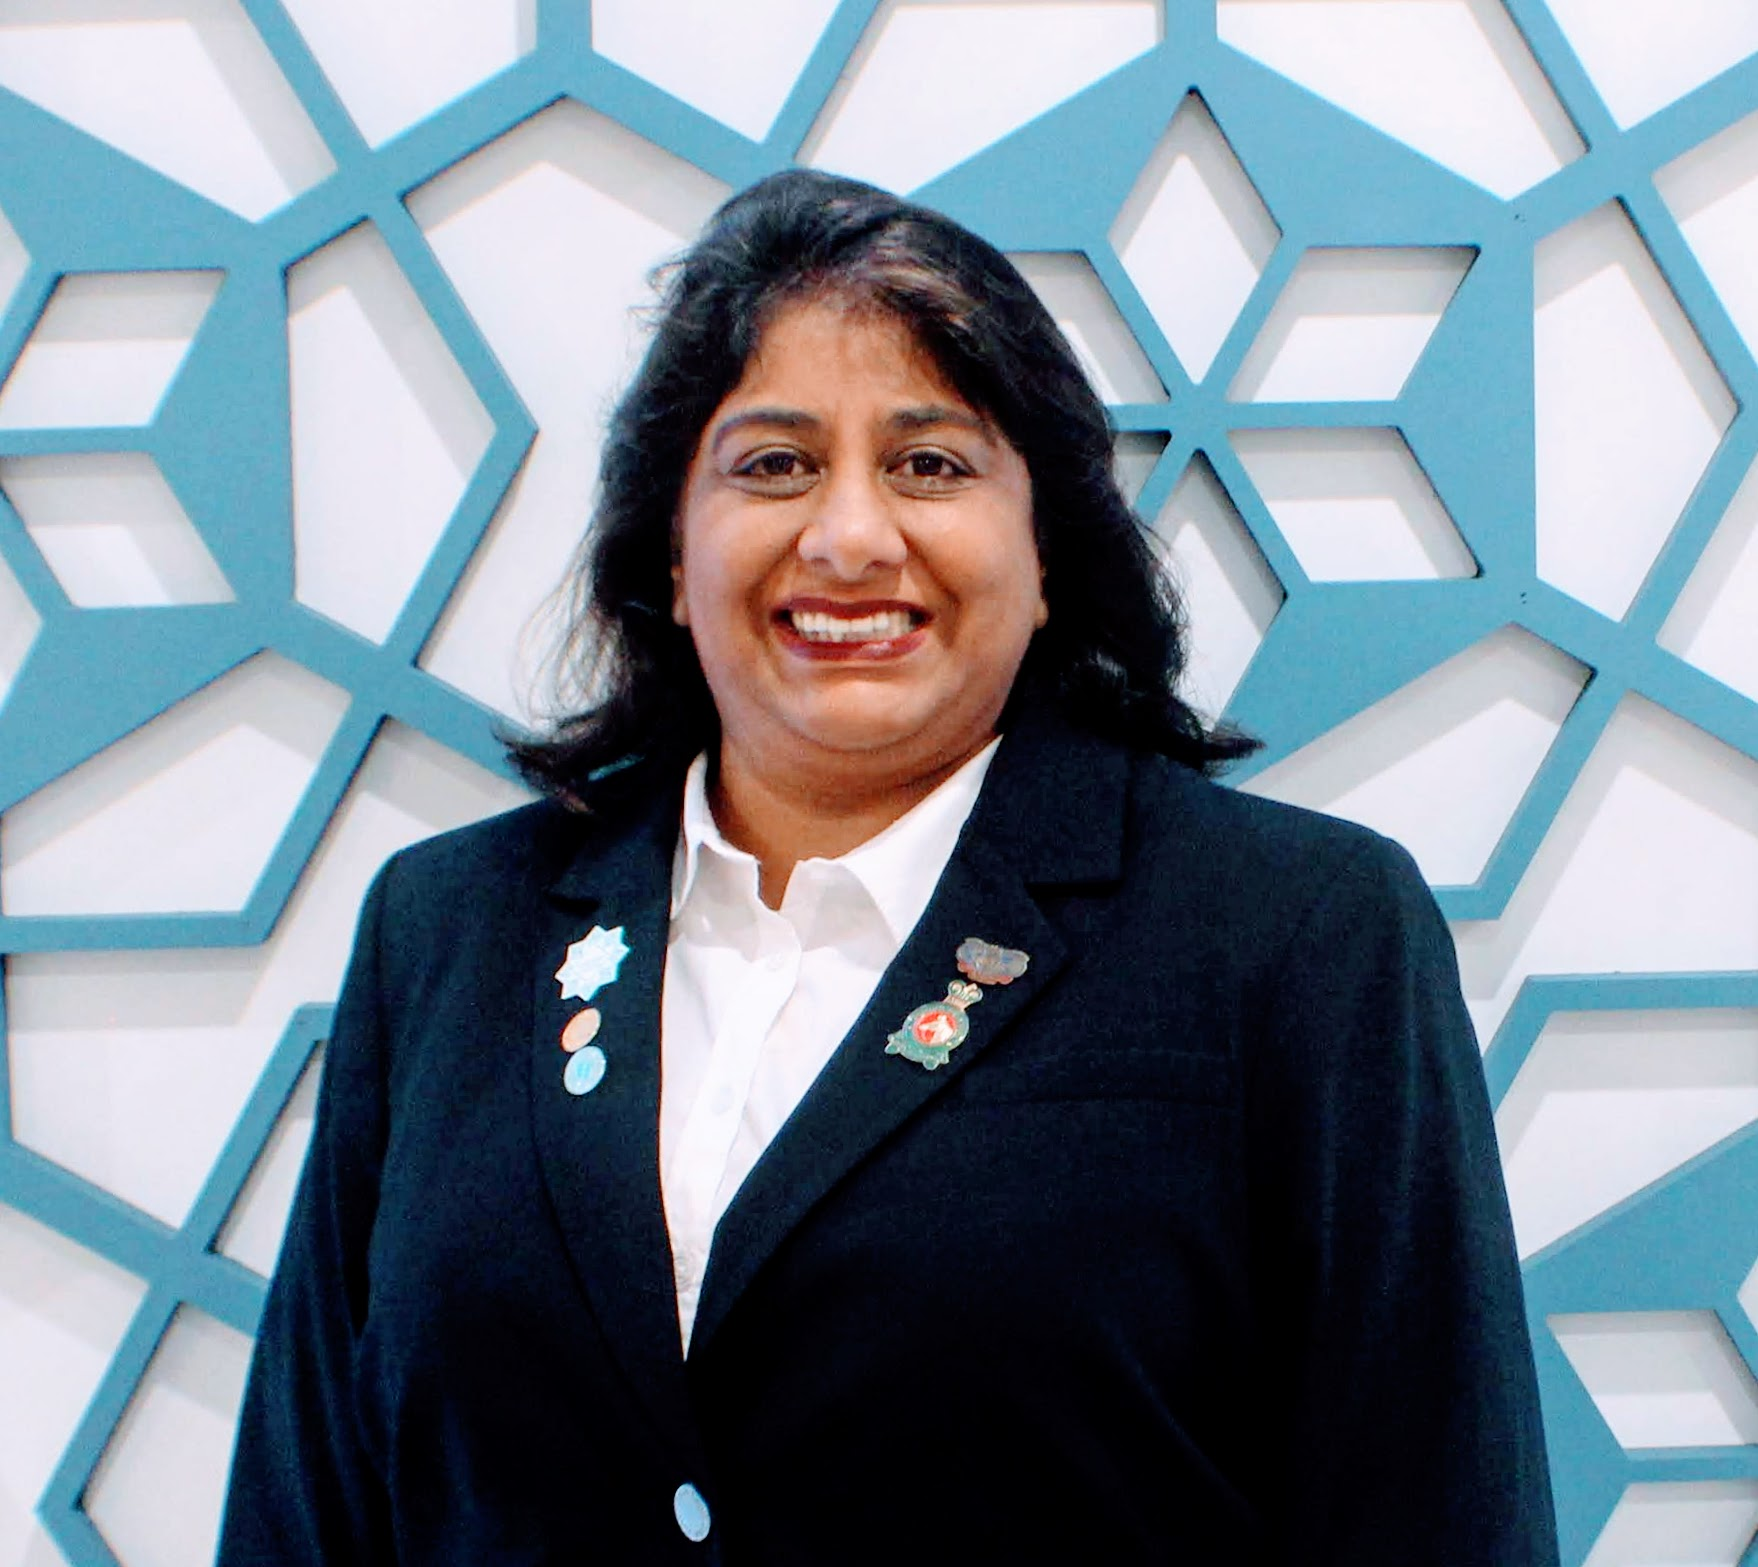 Karima Rajan started volunteering in the IVC in New Jersey in 1982.